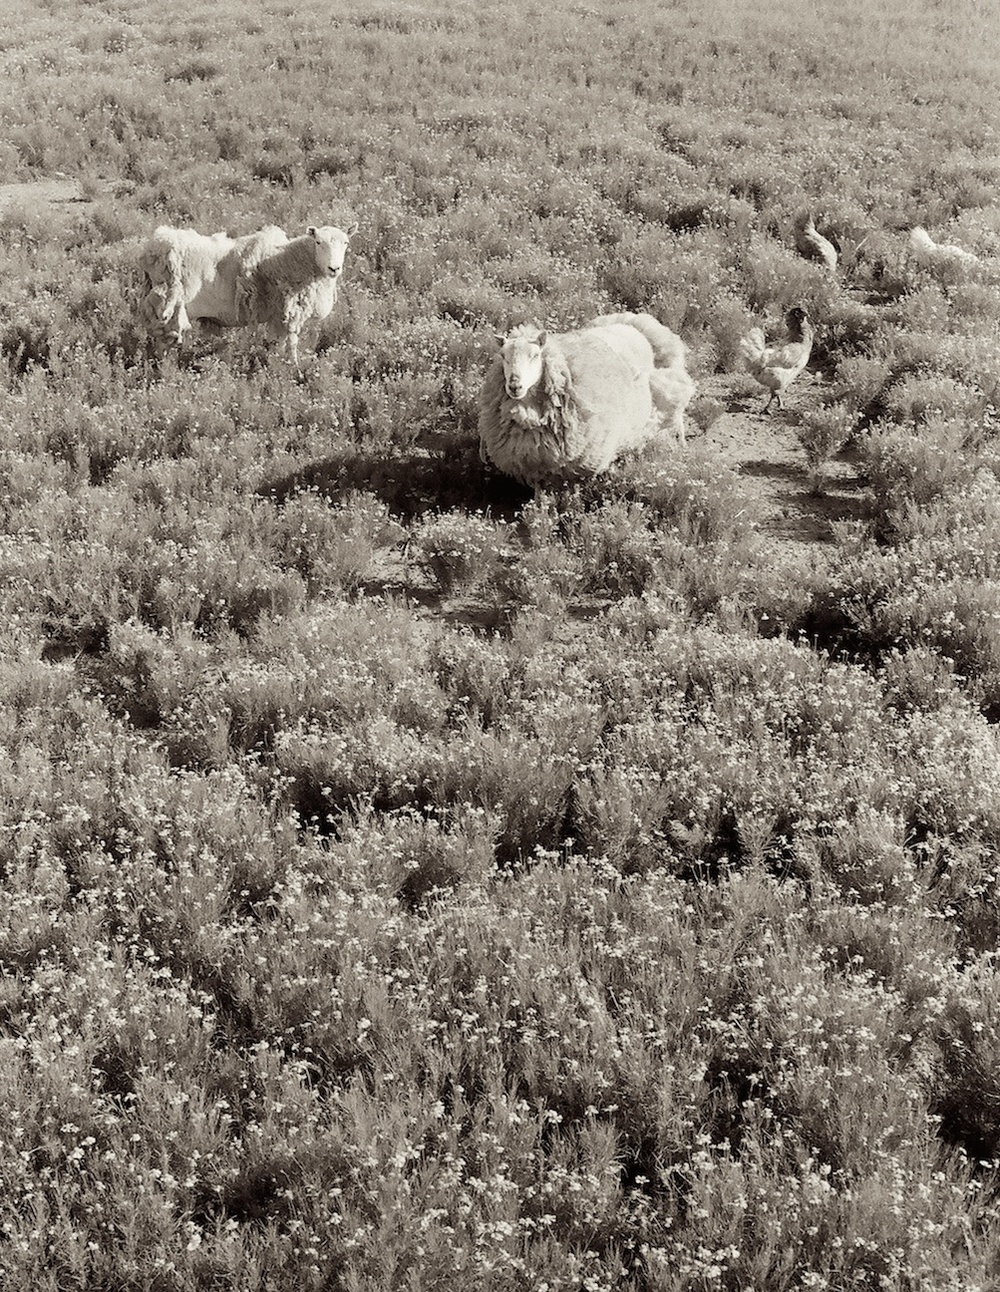 Sheepish Sm.jpeg